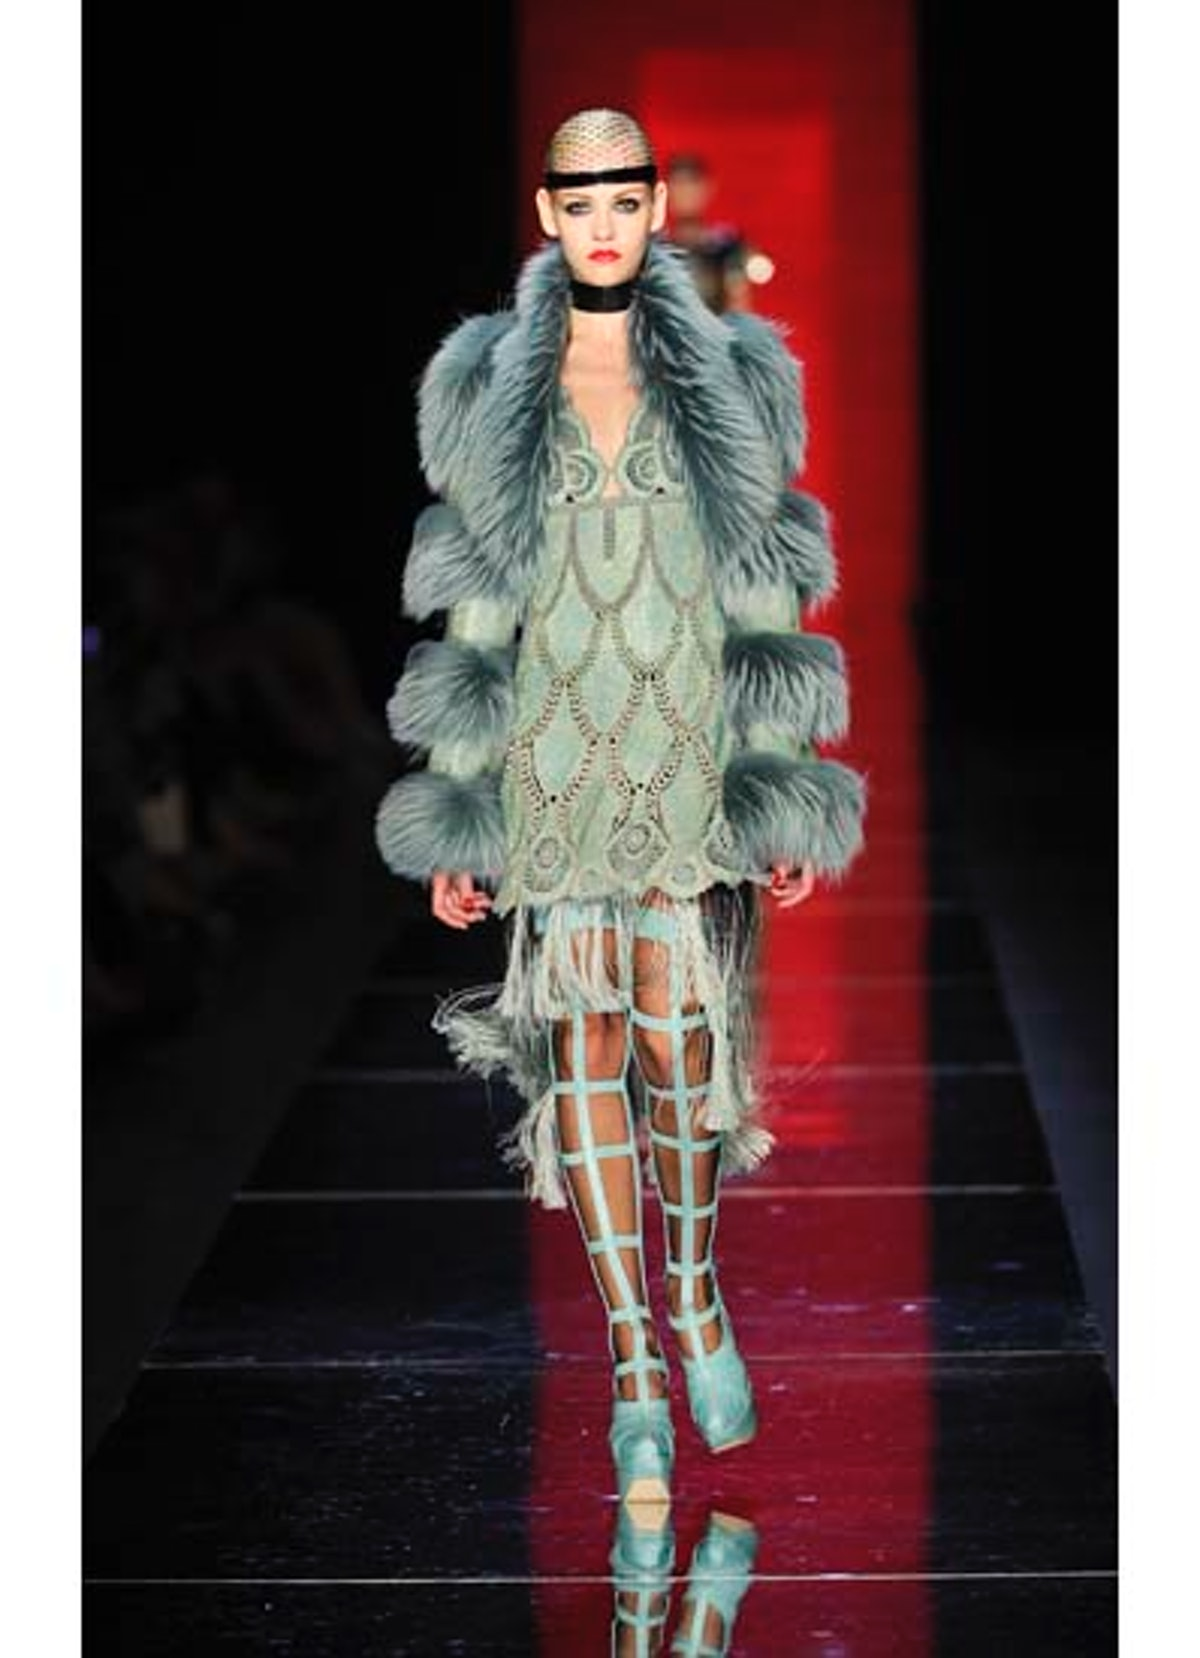 fass-jean-paul-gaultier-couture-2012-runway-29-v.jpg